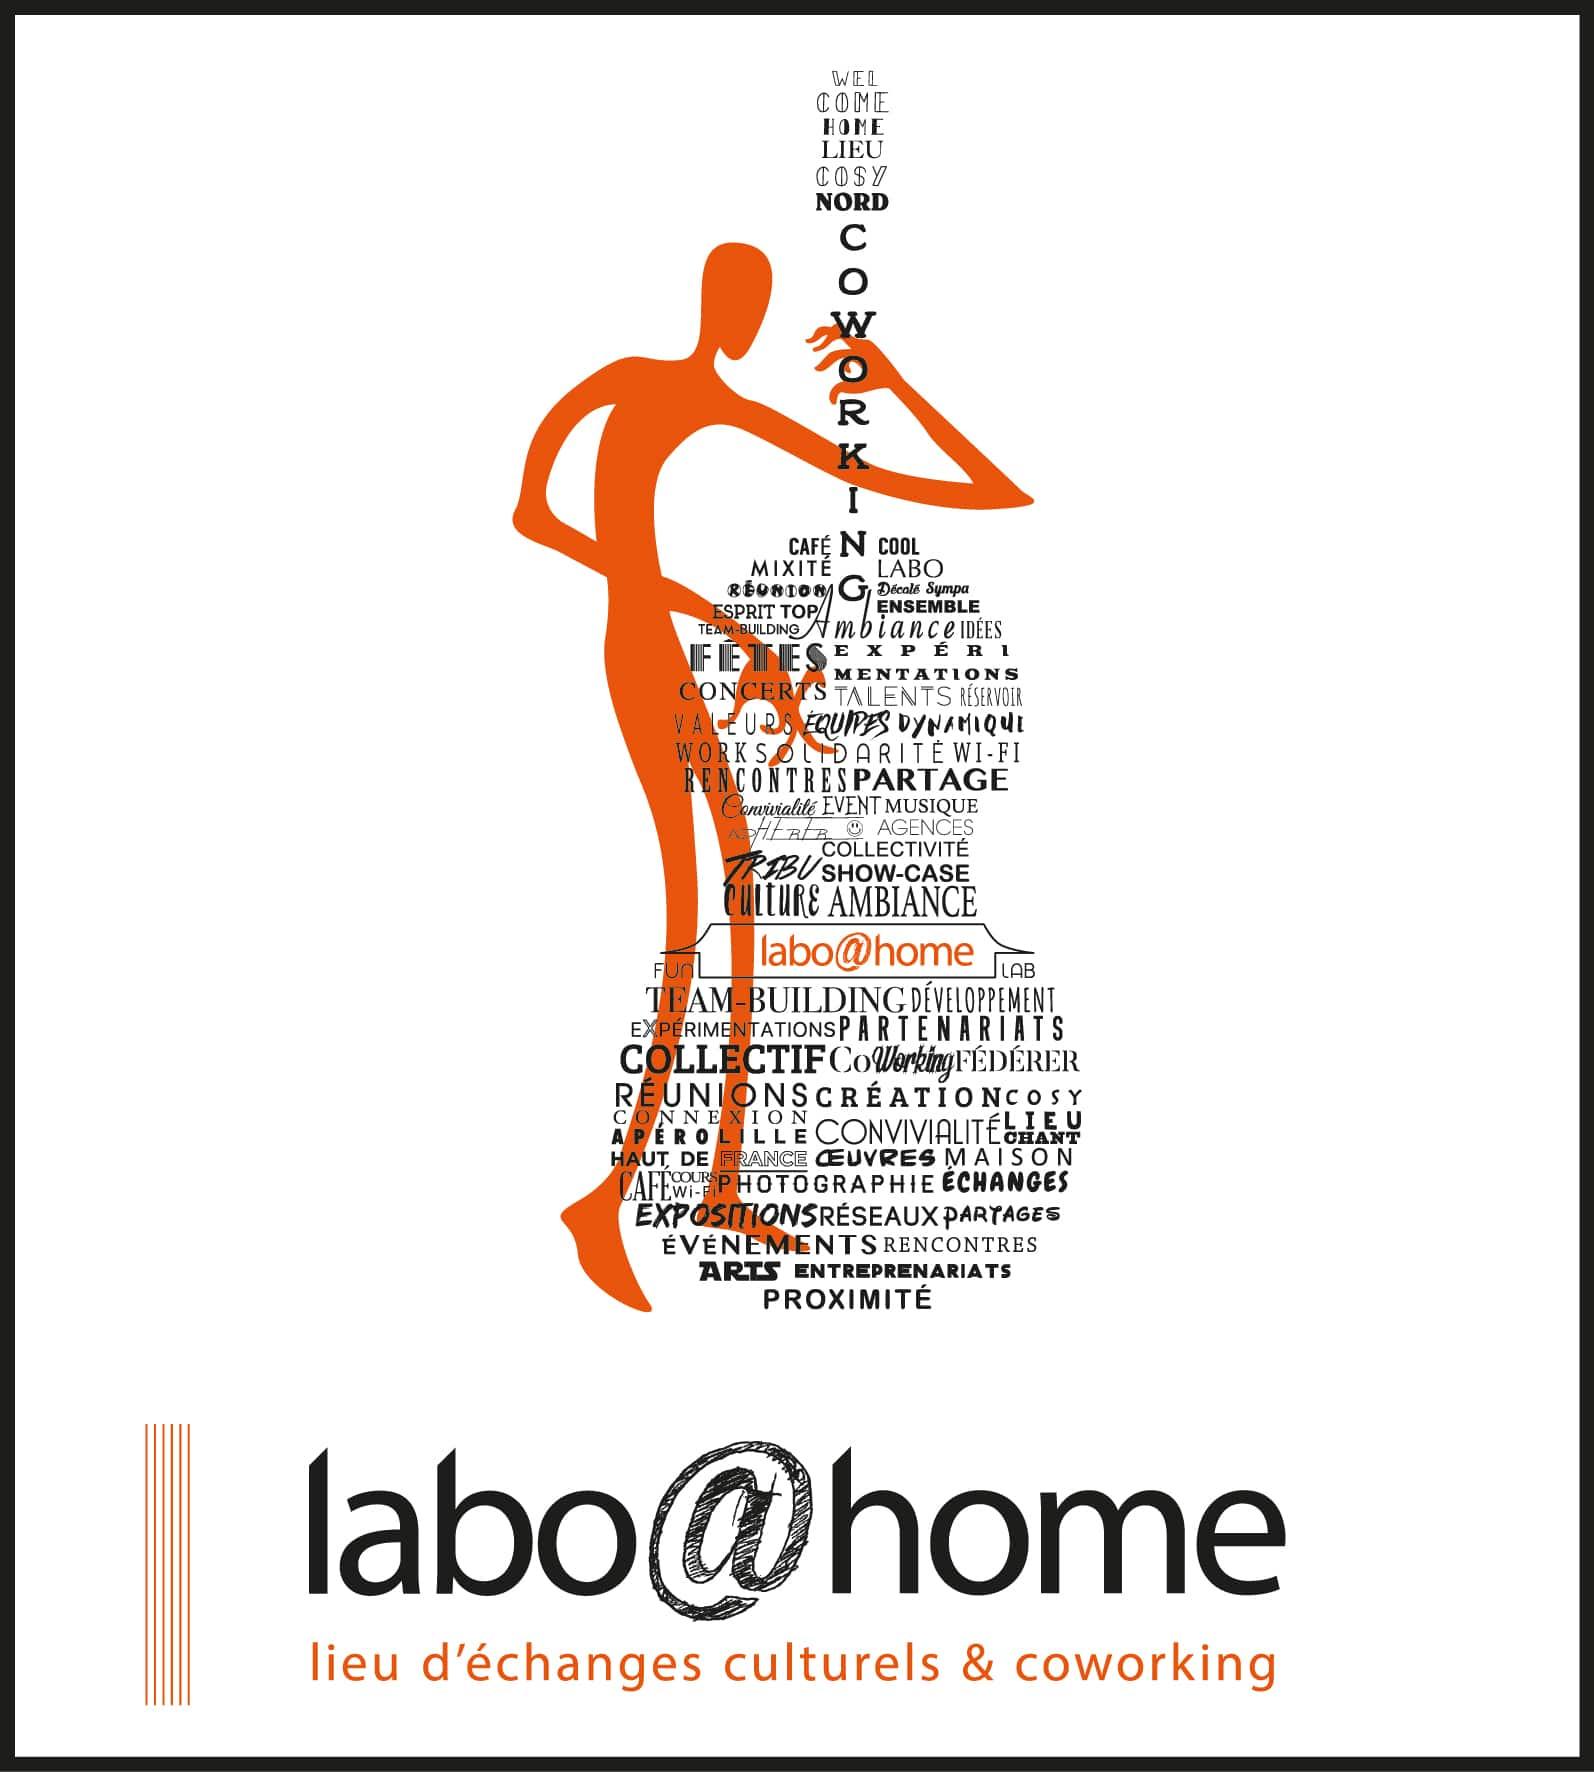 logo laboathome web